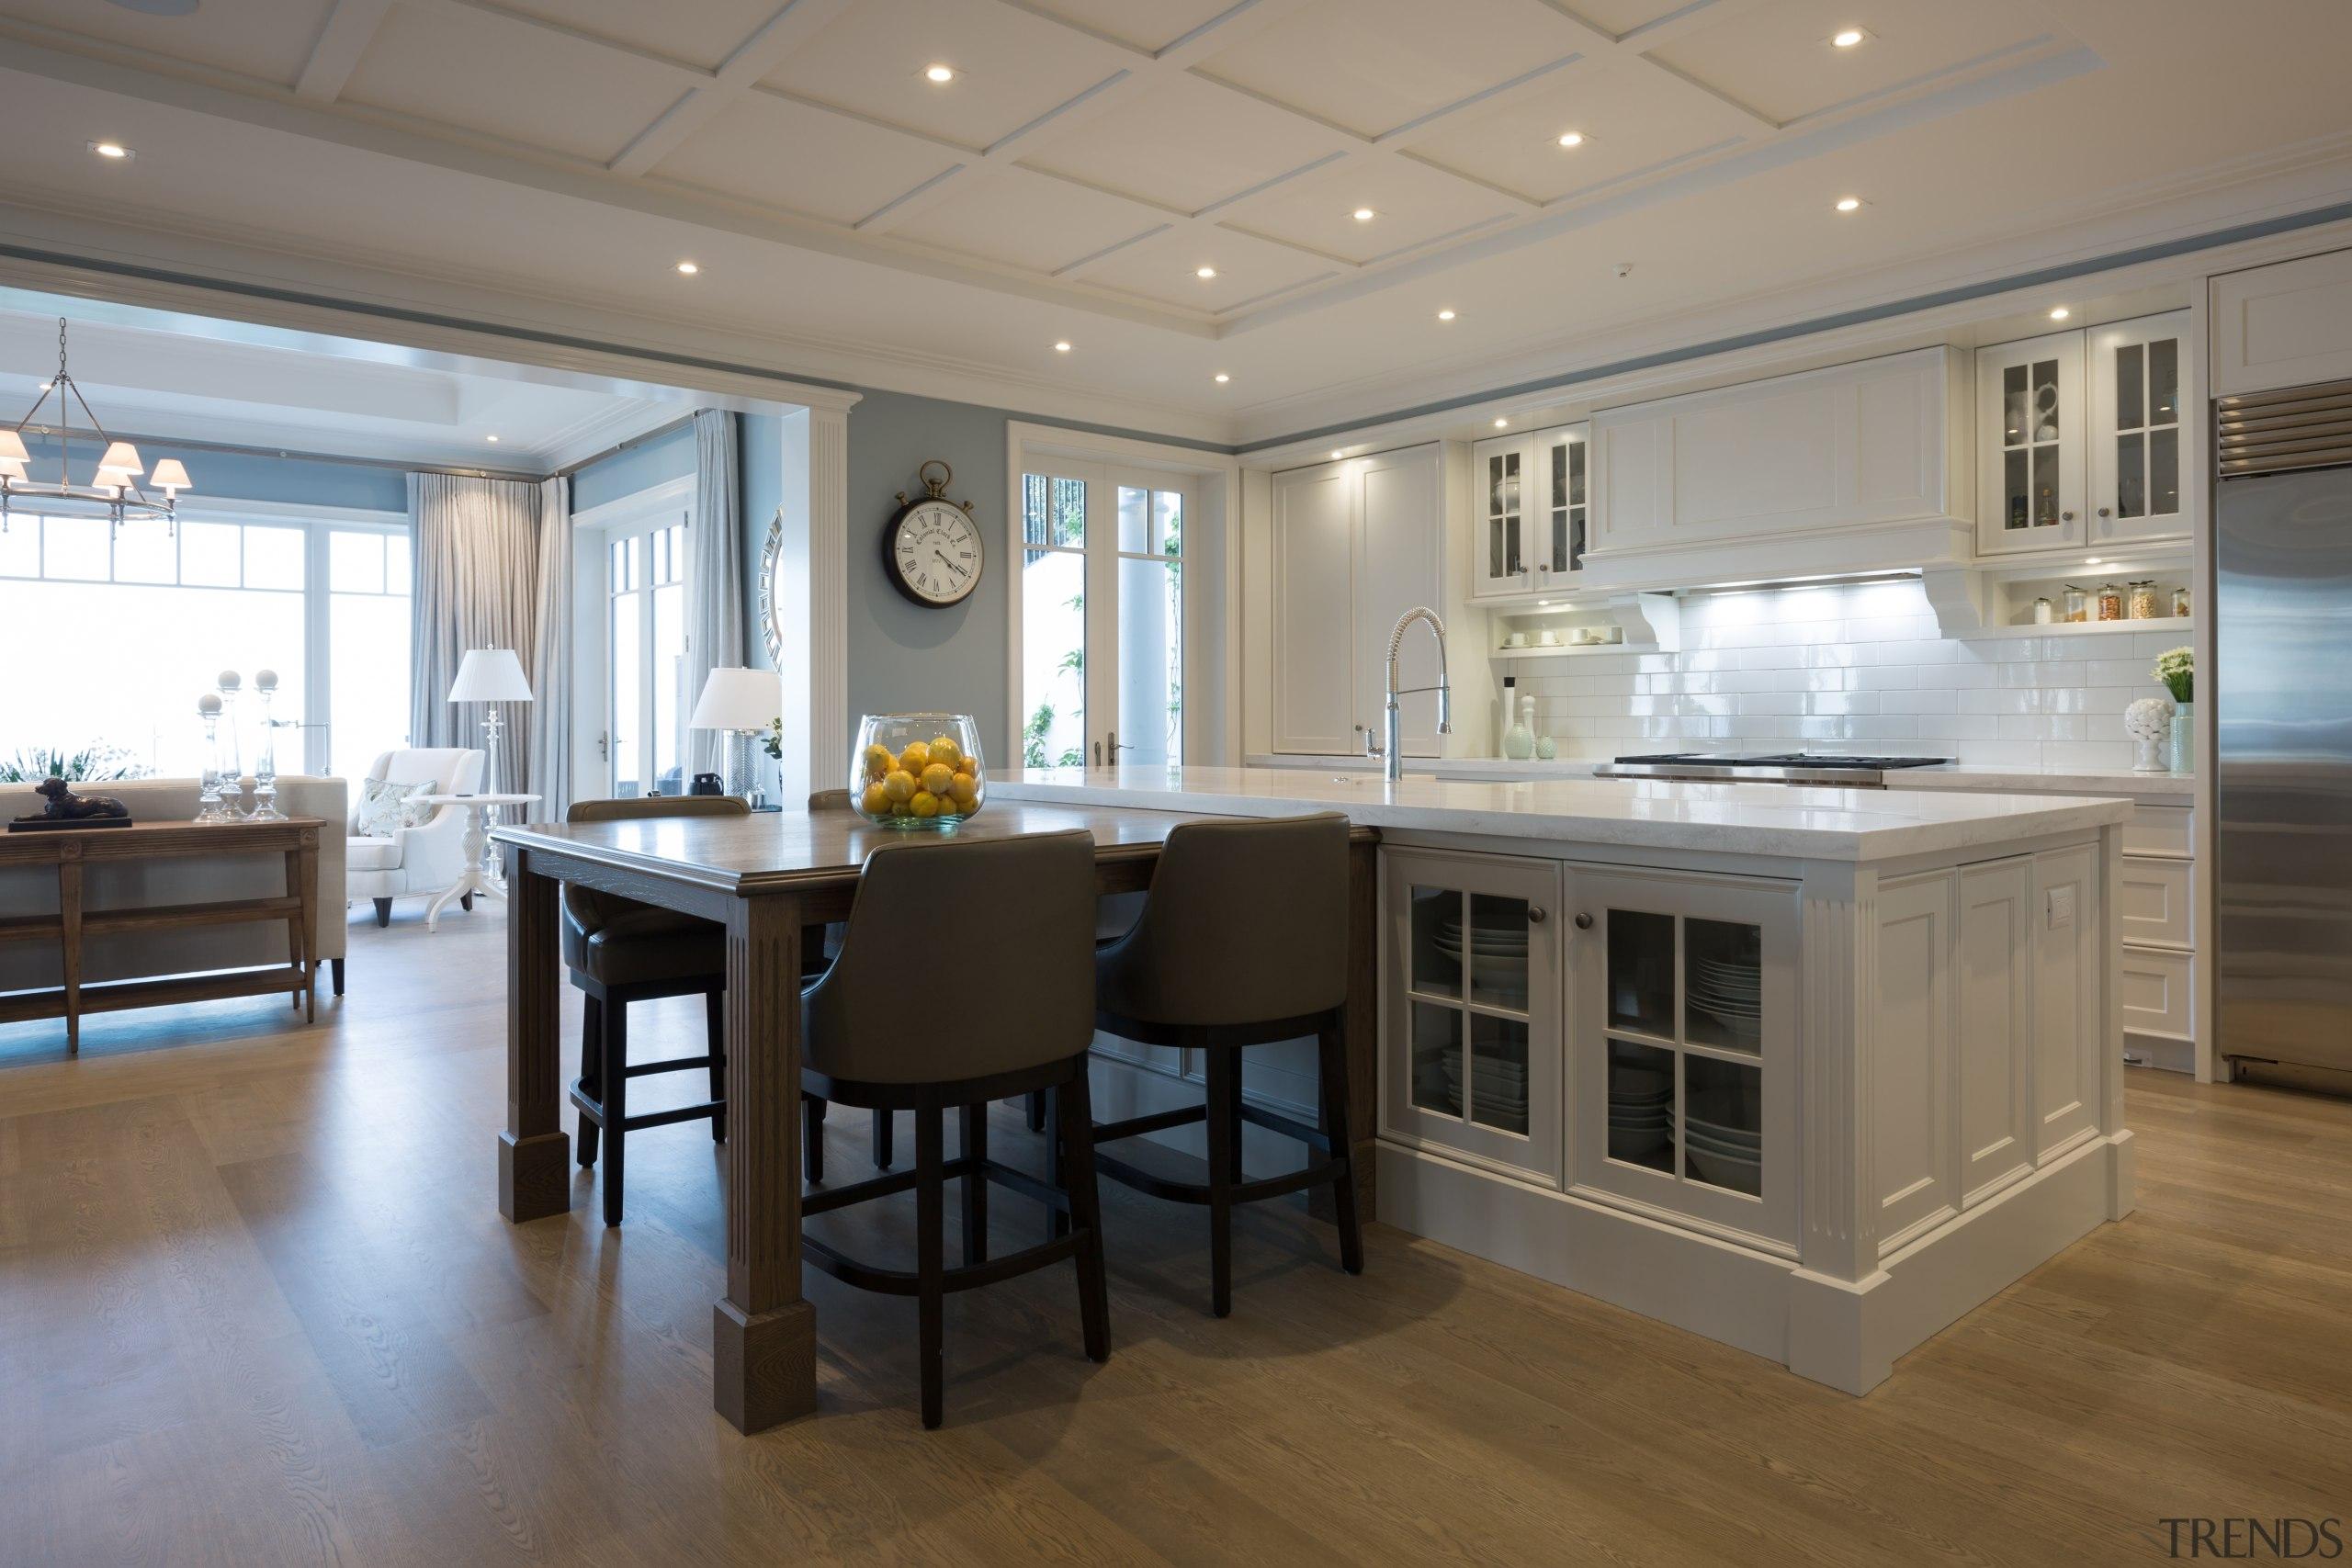 Campbells Bay - countertop | cuisine classique | countertop, cuisine classique, floor, flooring, interior design, kitchen, room, gray